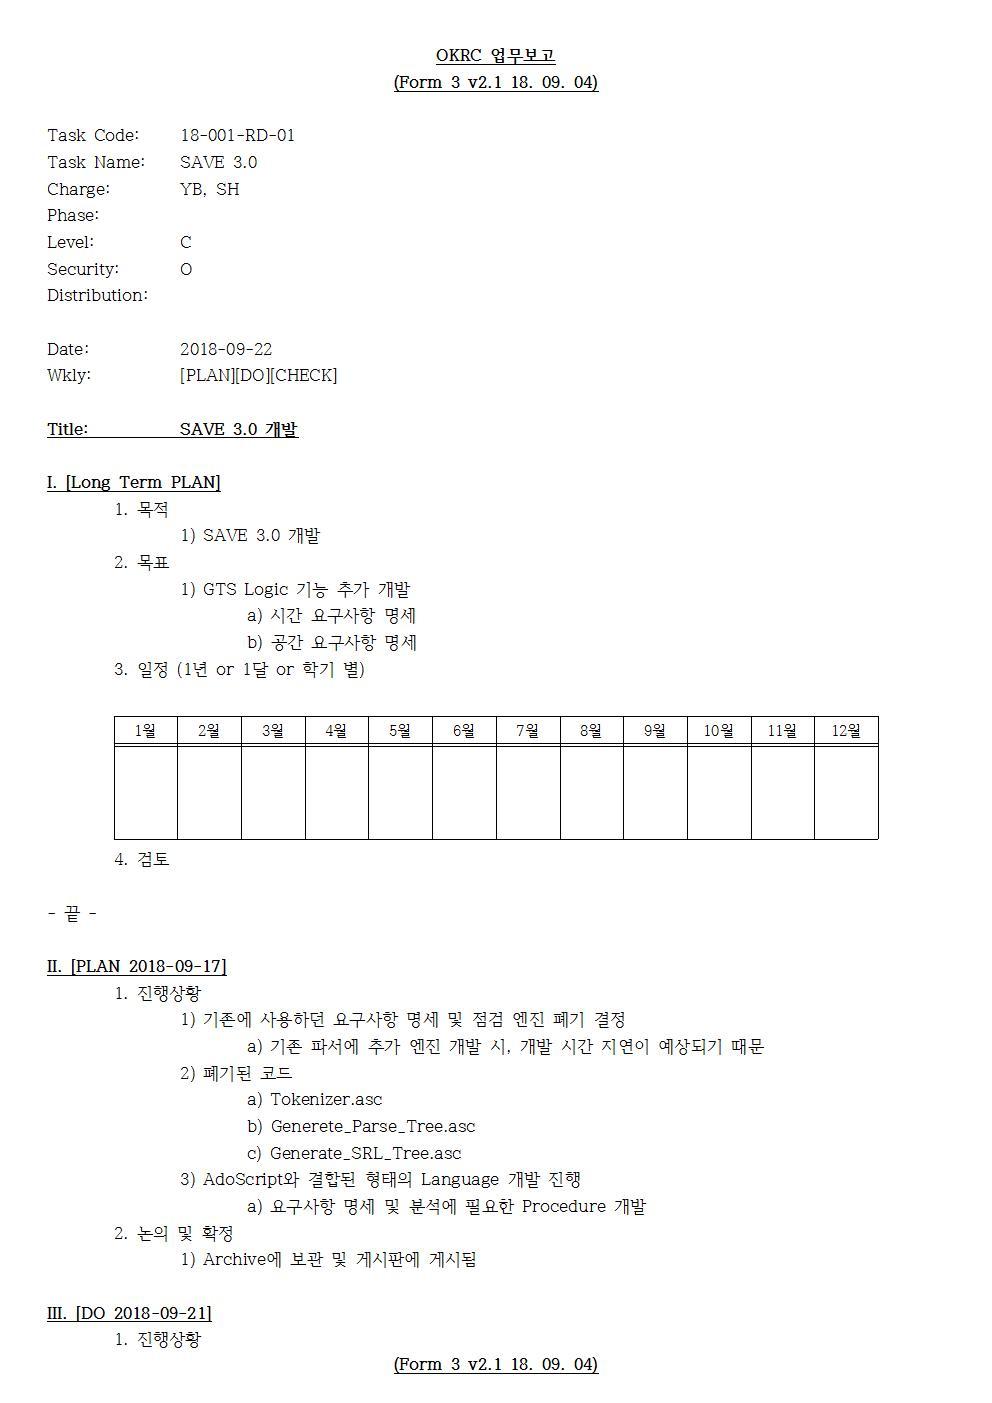 D-[18-001-RD-01]-[SAVE 3.0]-[2018-09-22][SH]001.jpg